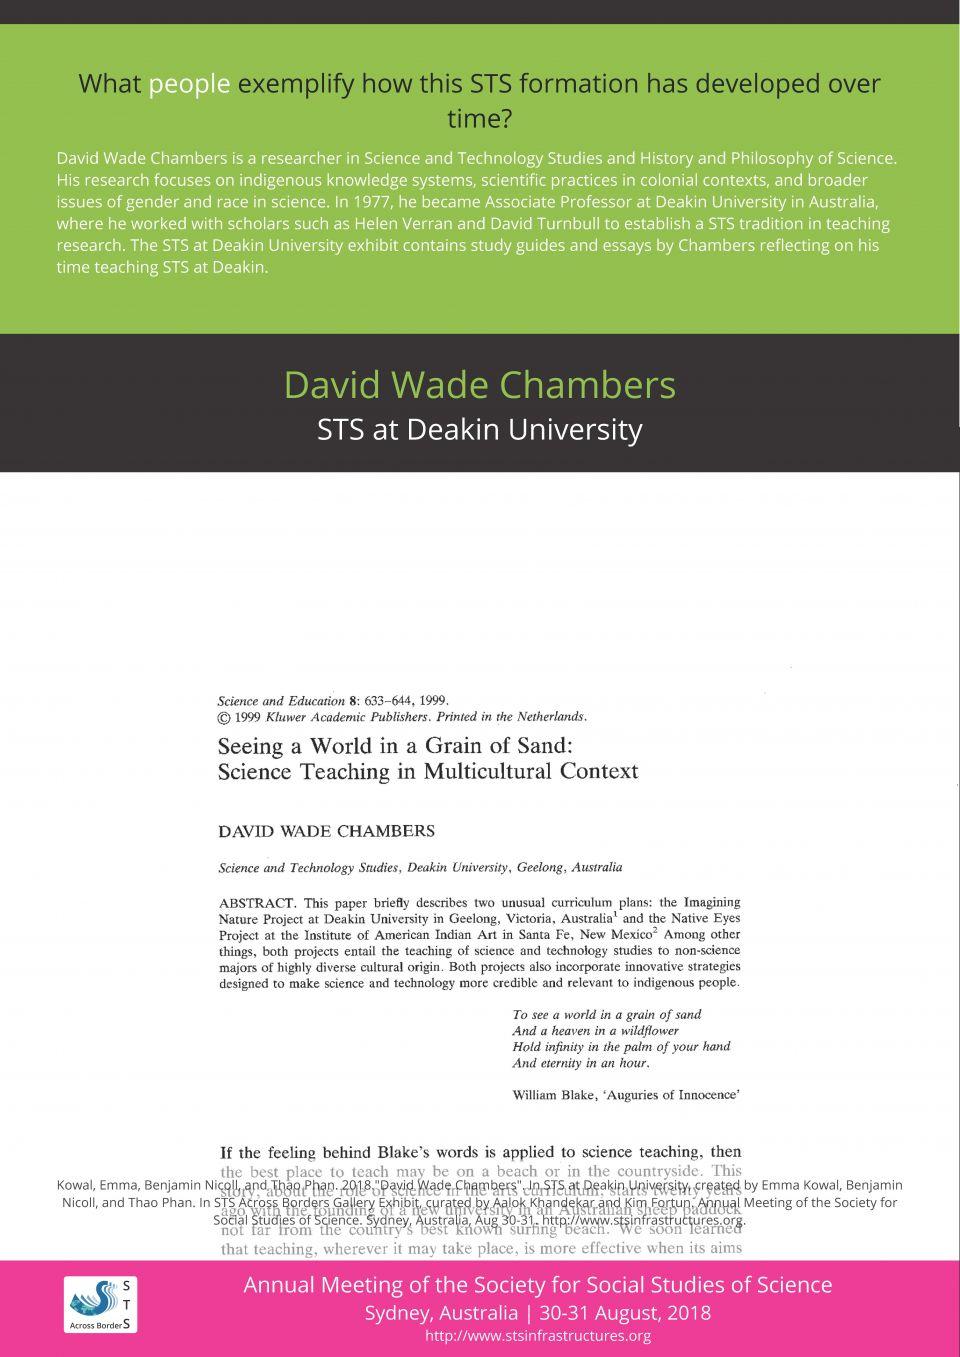 David Wade Chambers